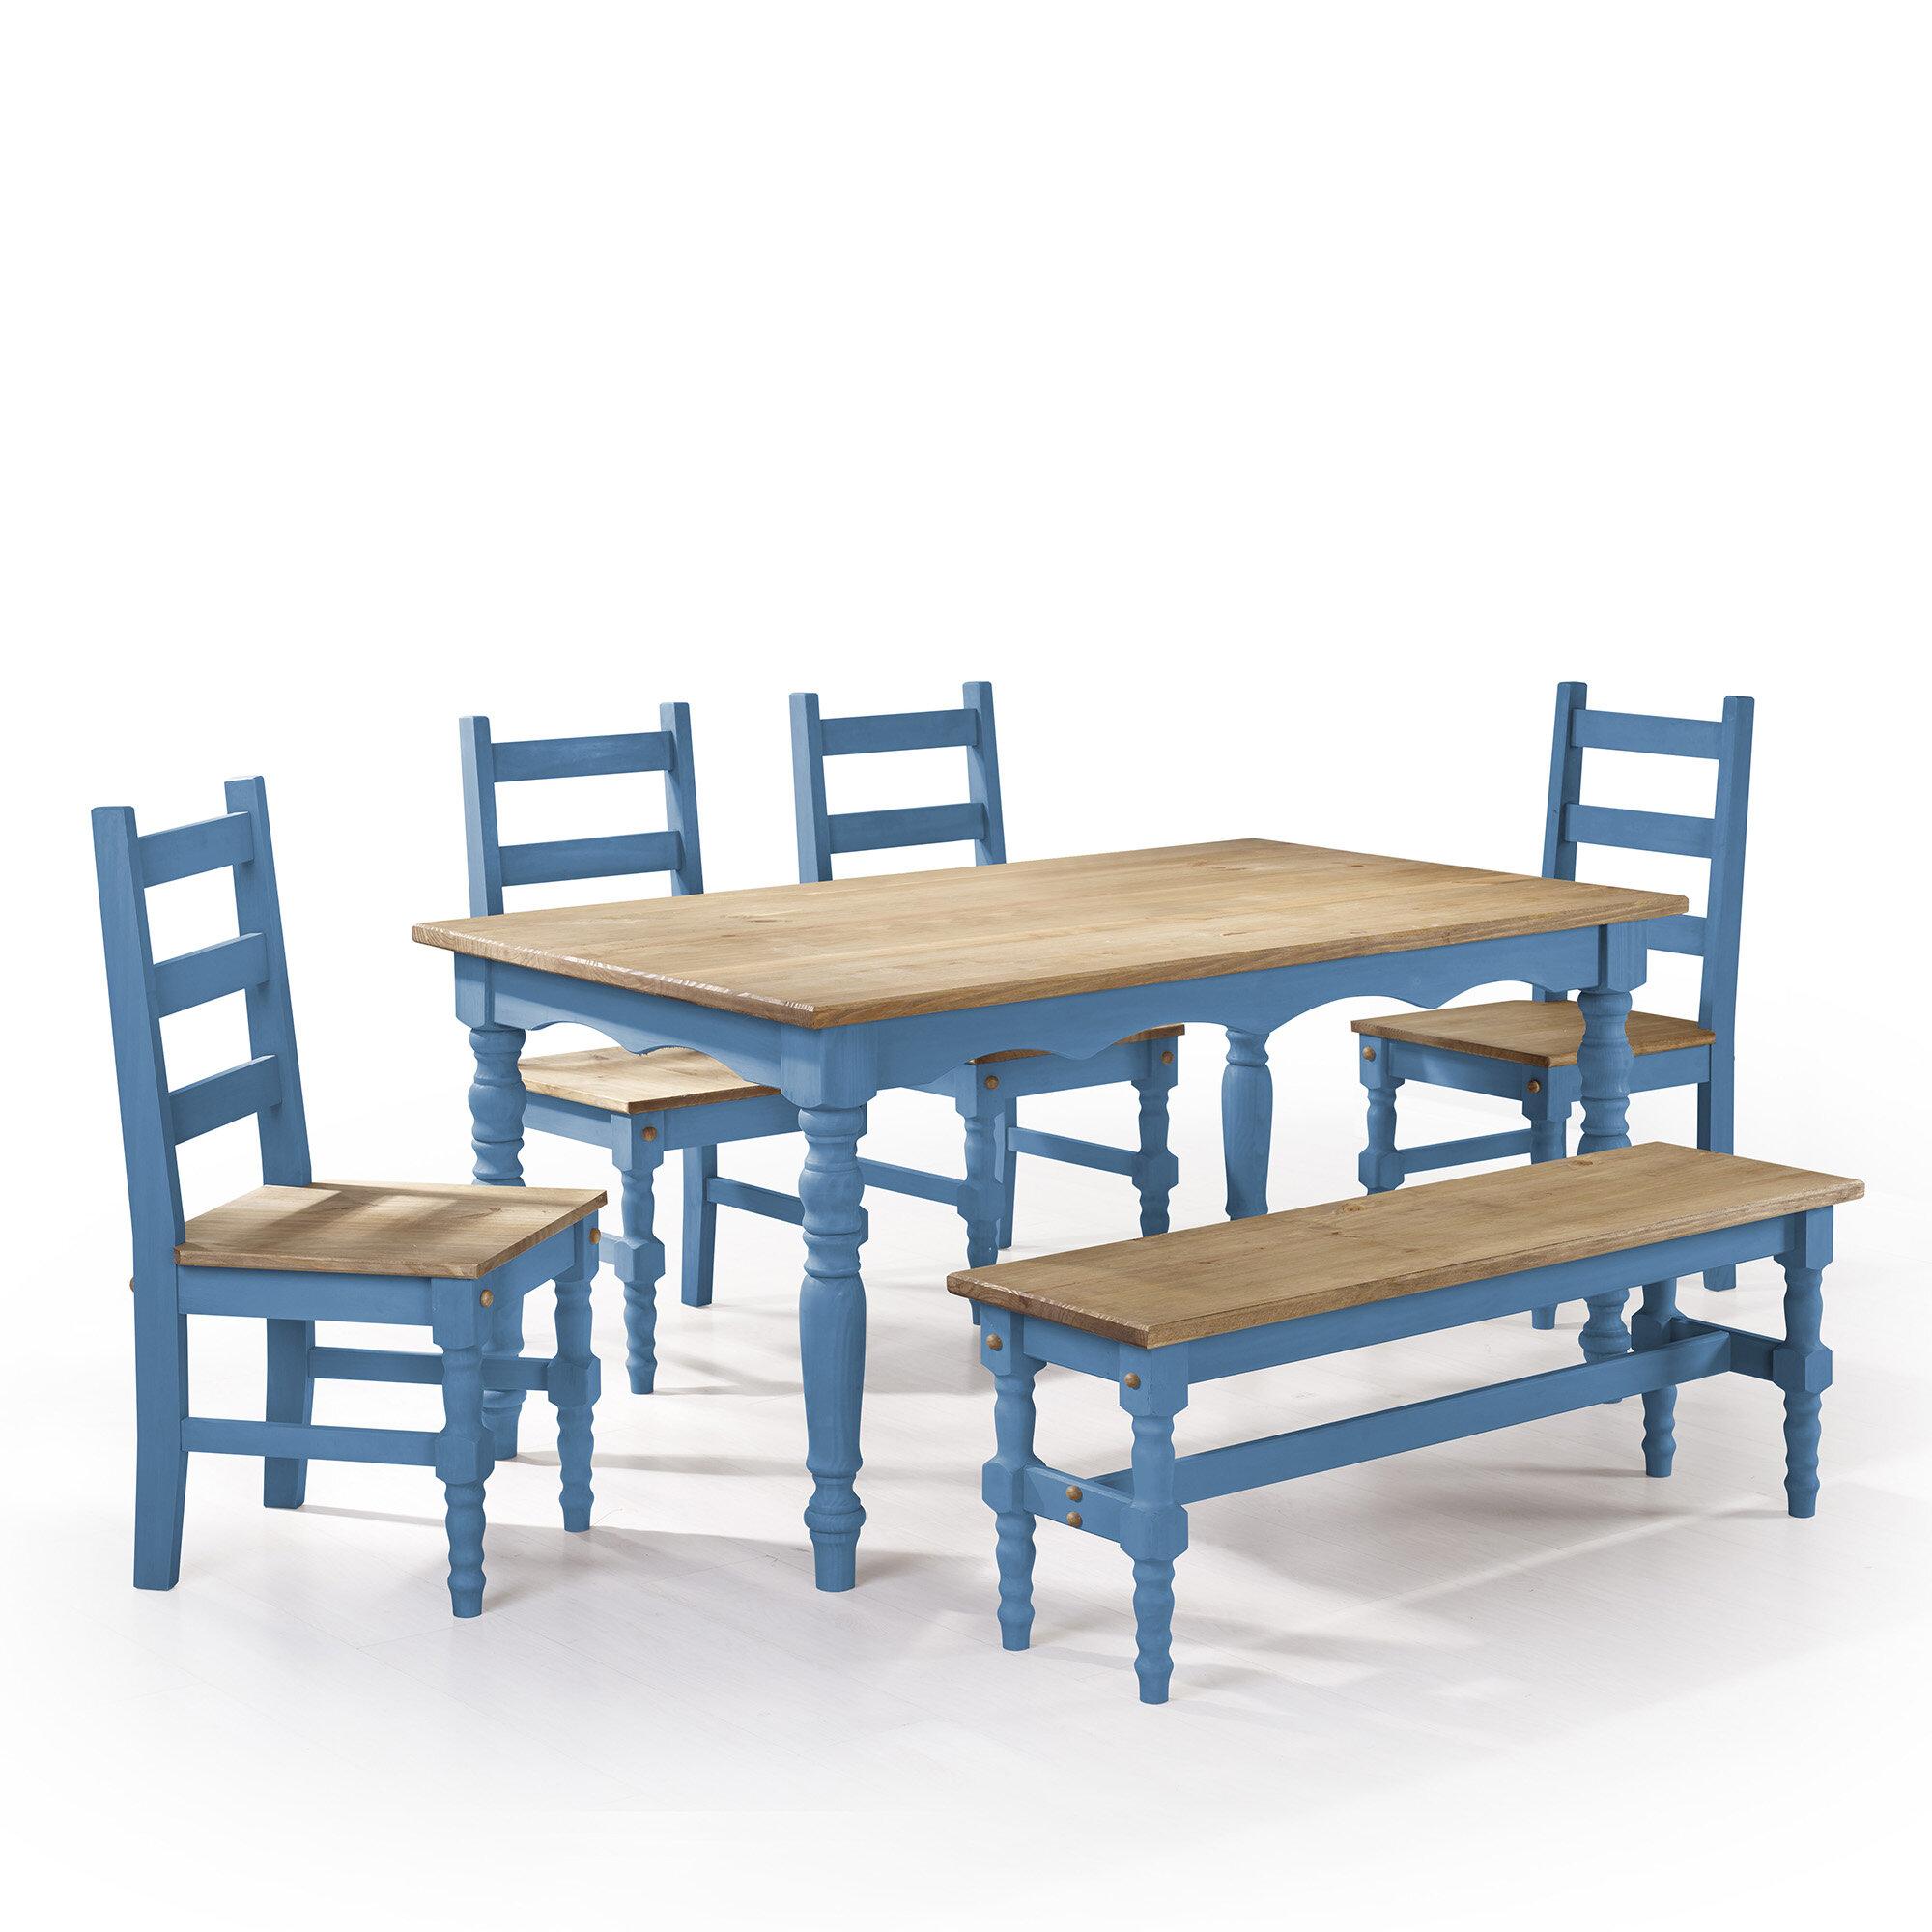 Gracie Oaks Pinard Solid Wood Dining Set & Reviews | Wayfair